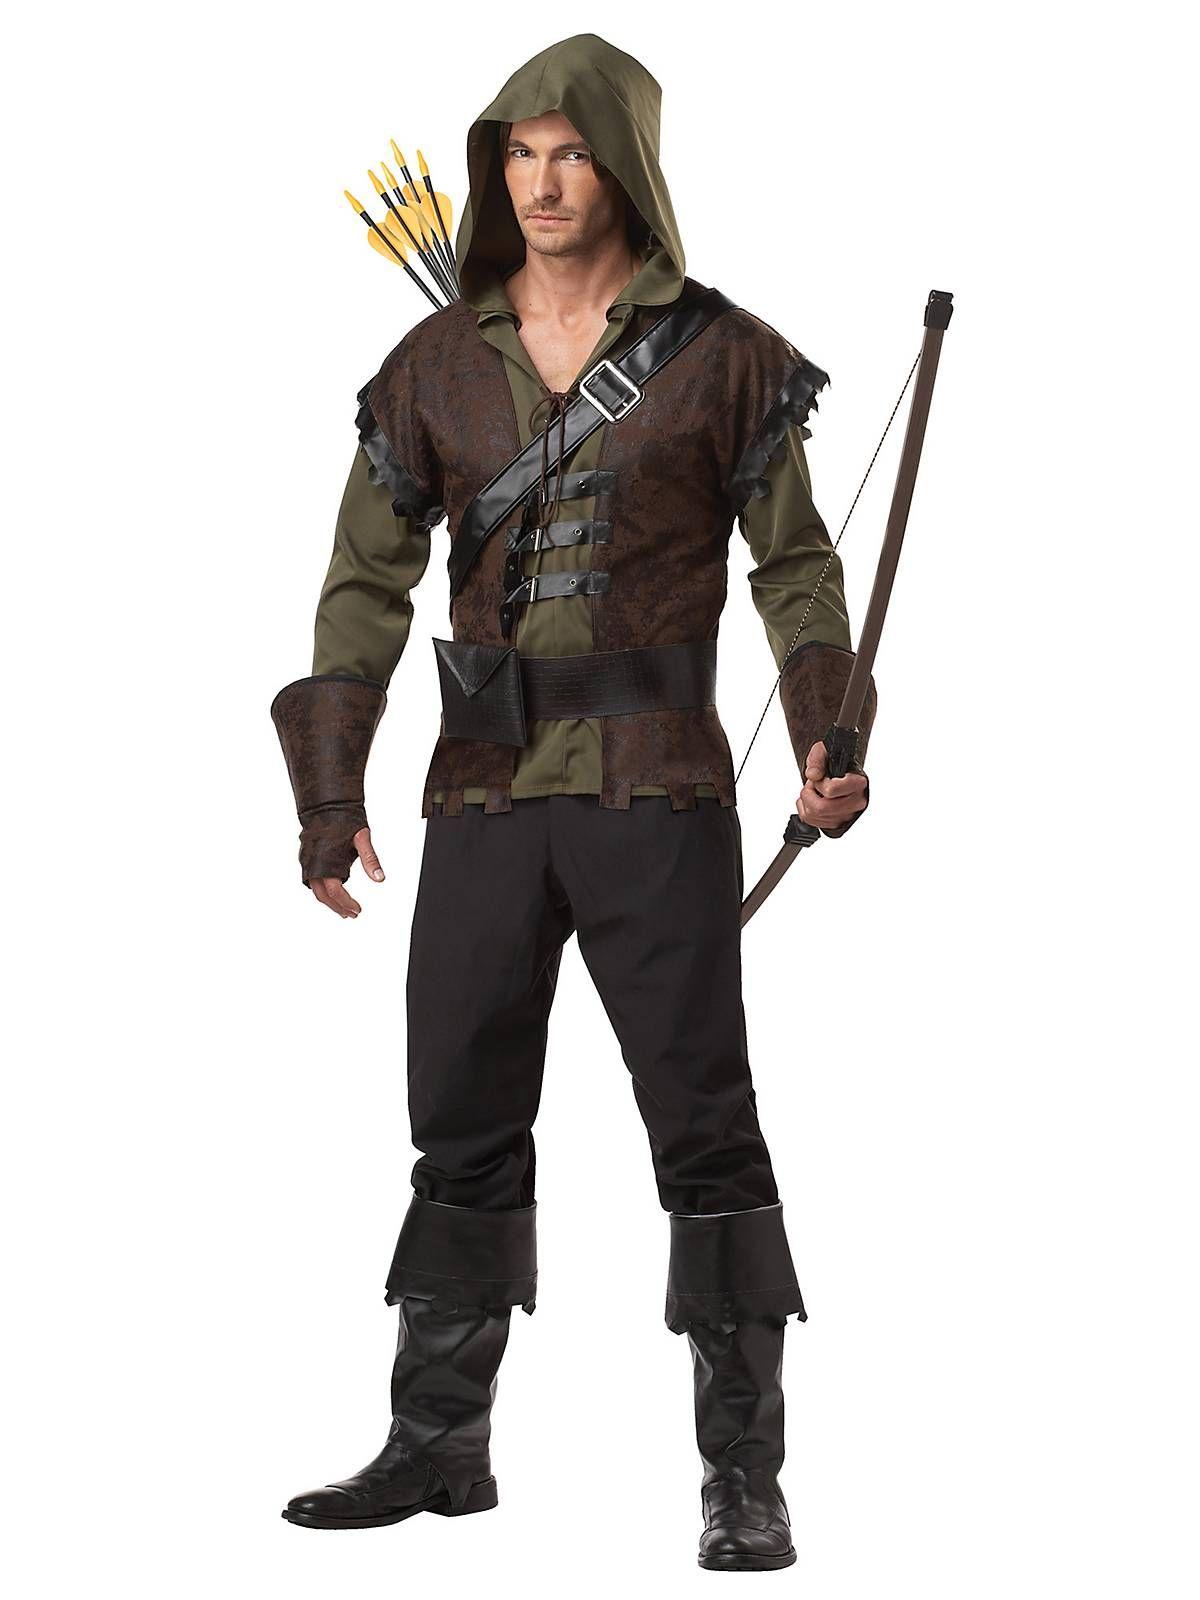 Renaissance Robin Hood Deluxe Kids Costume Set for Halloween Dress Up Party